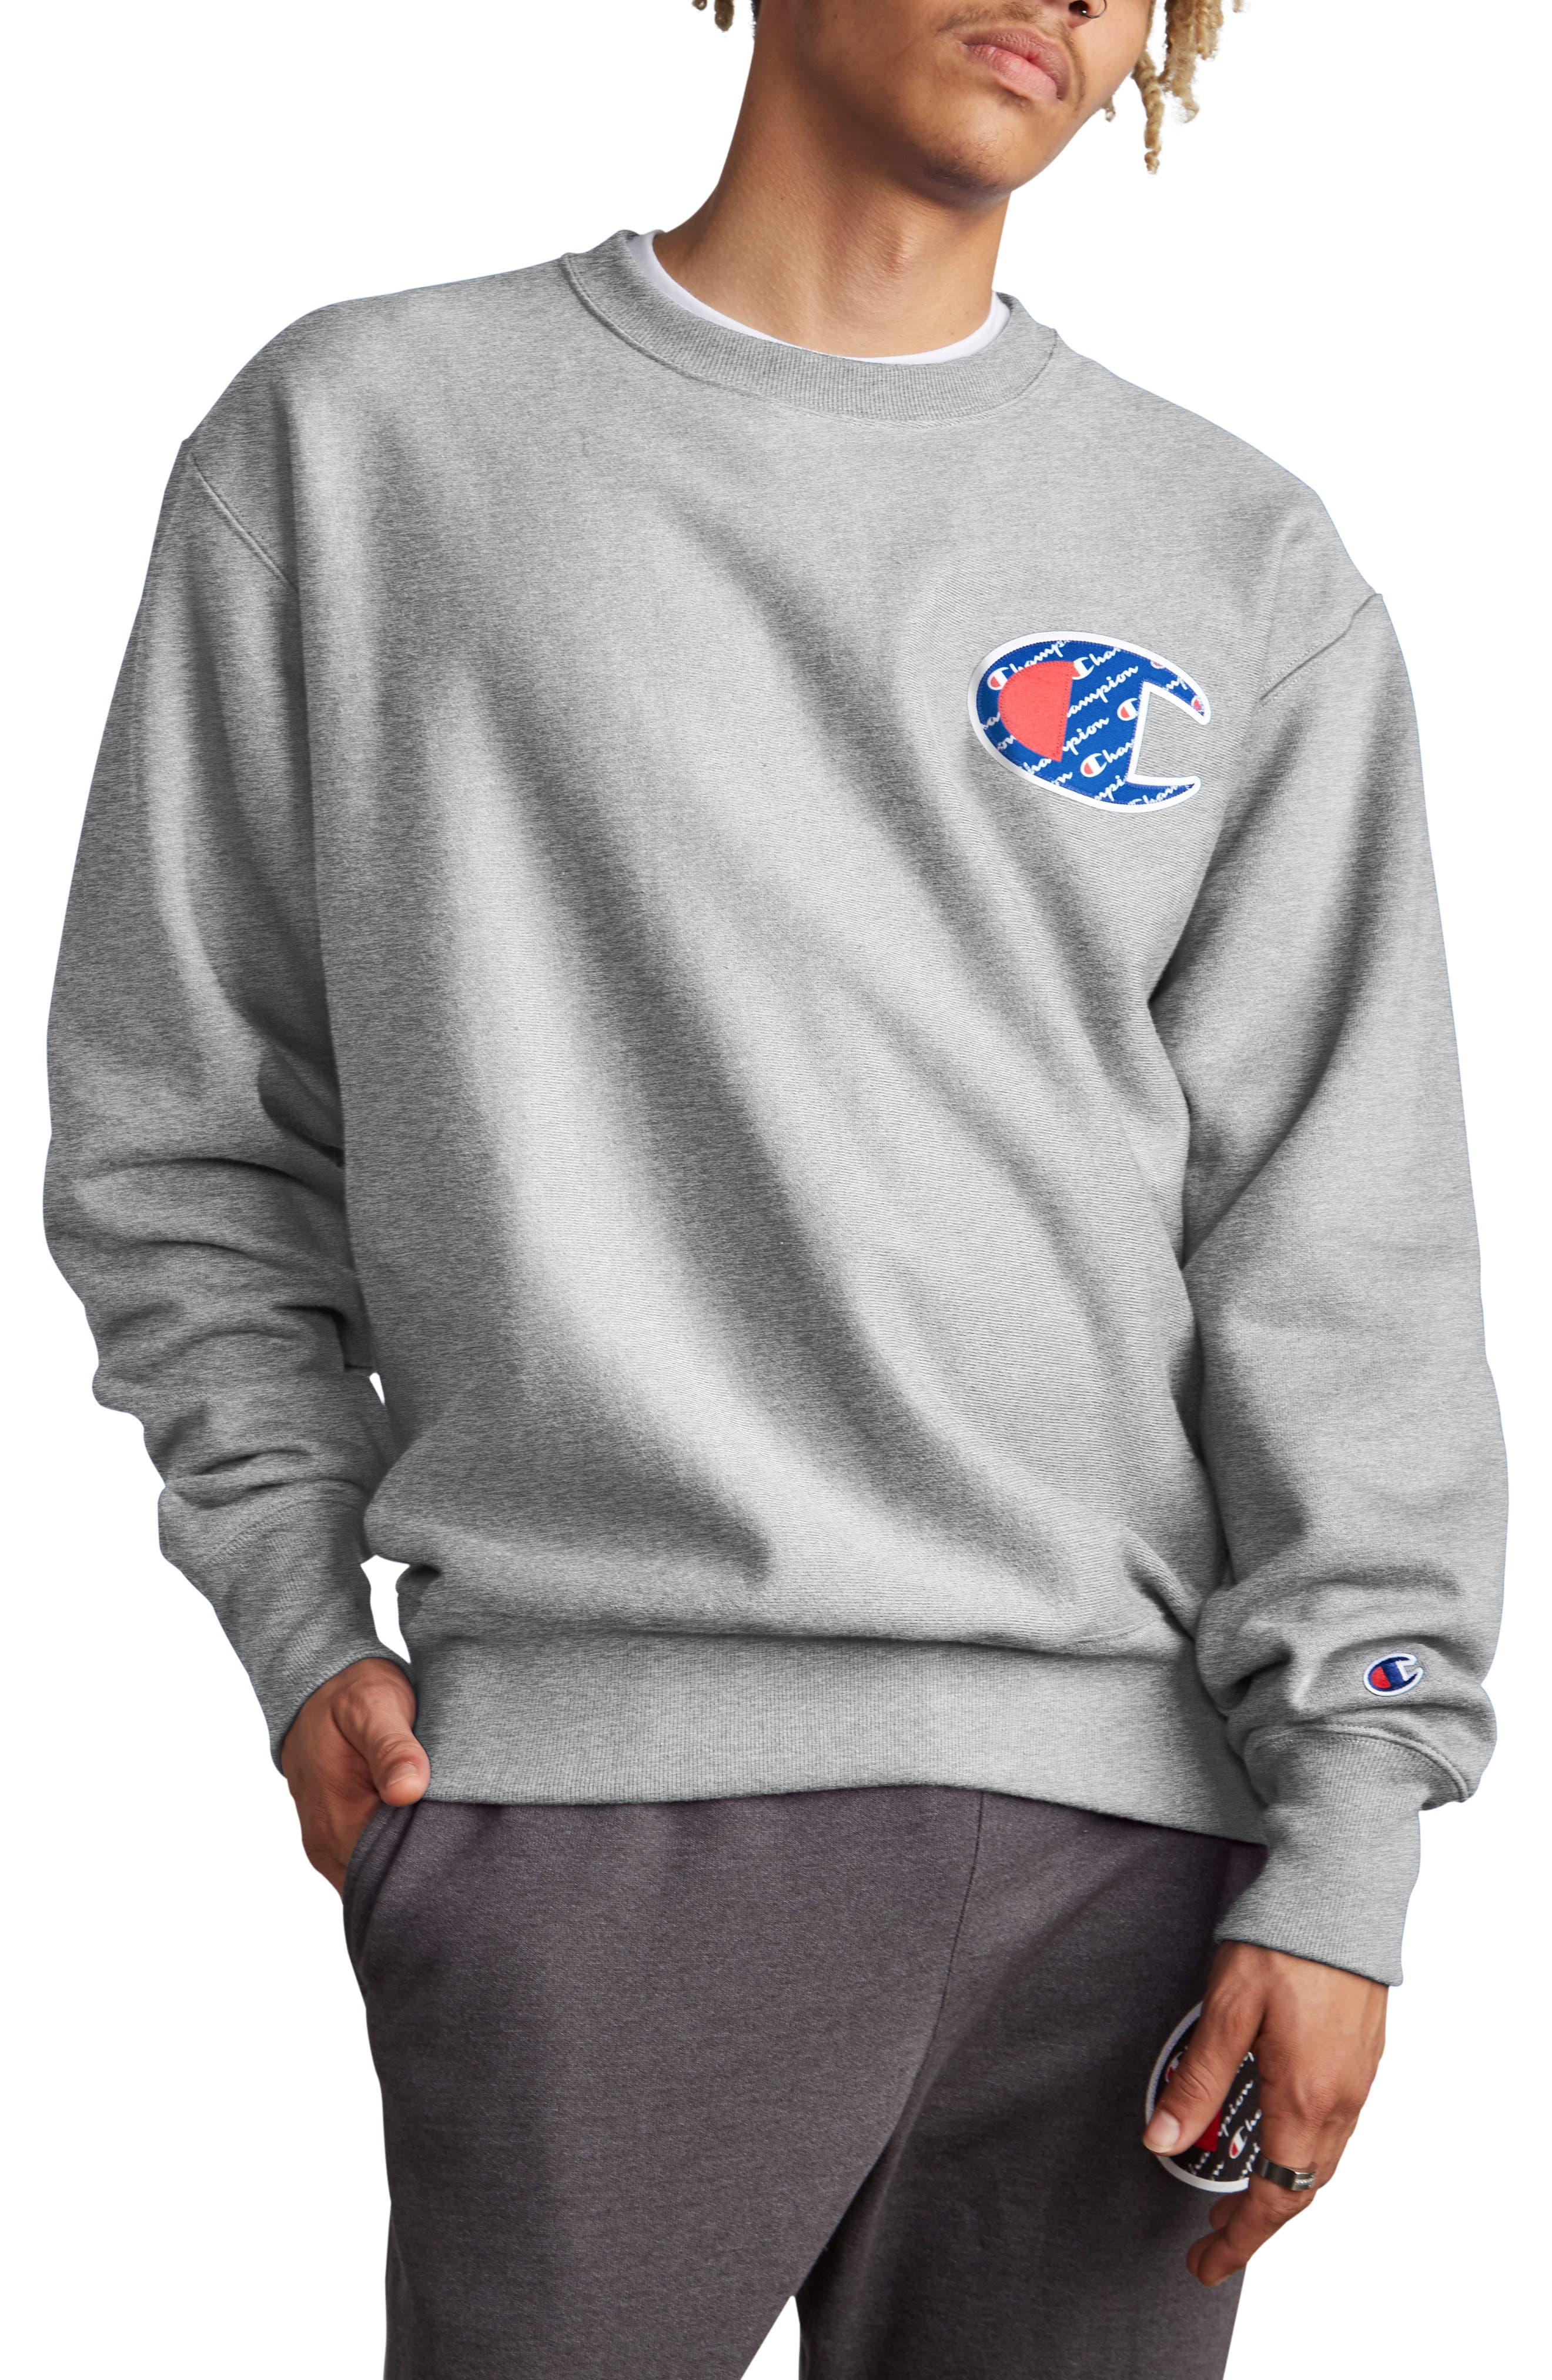 CHAMPION, Sublimated Logo Crewneck Sweatshirt, Main thumbnail 1, color, OXFORD GREY